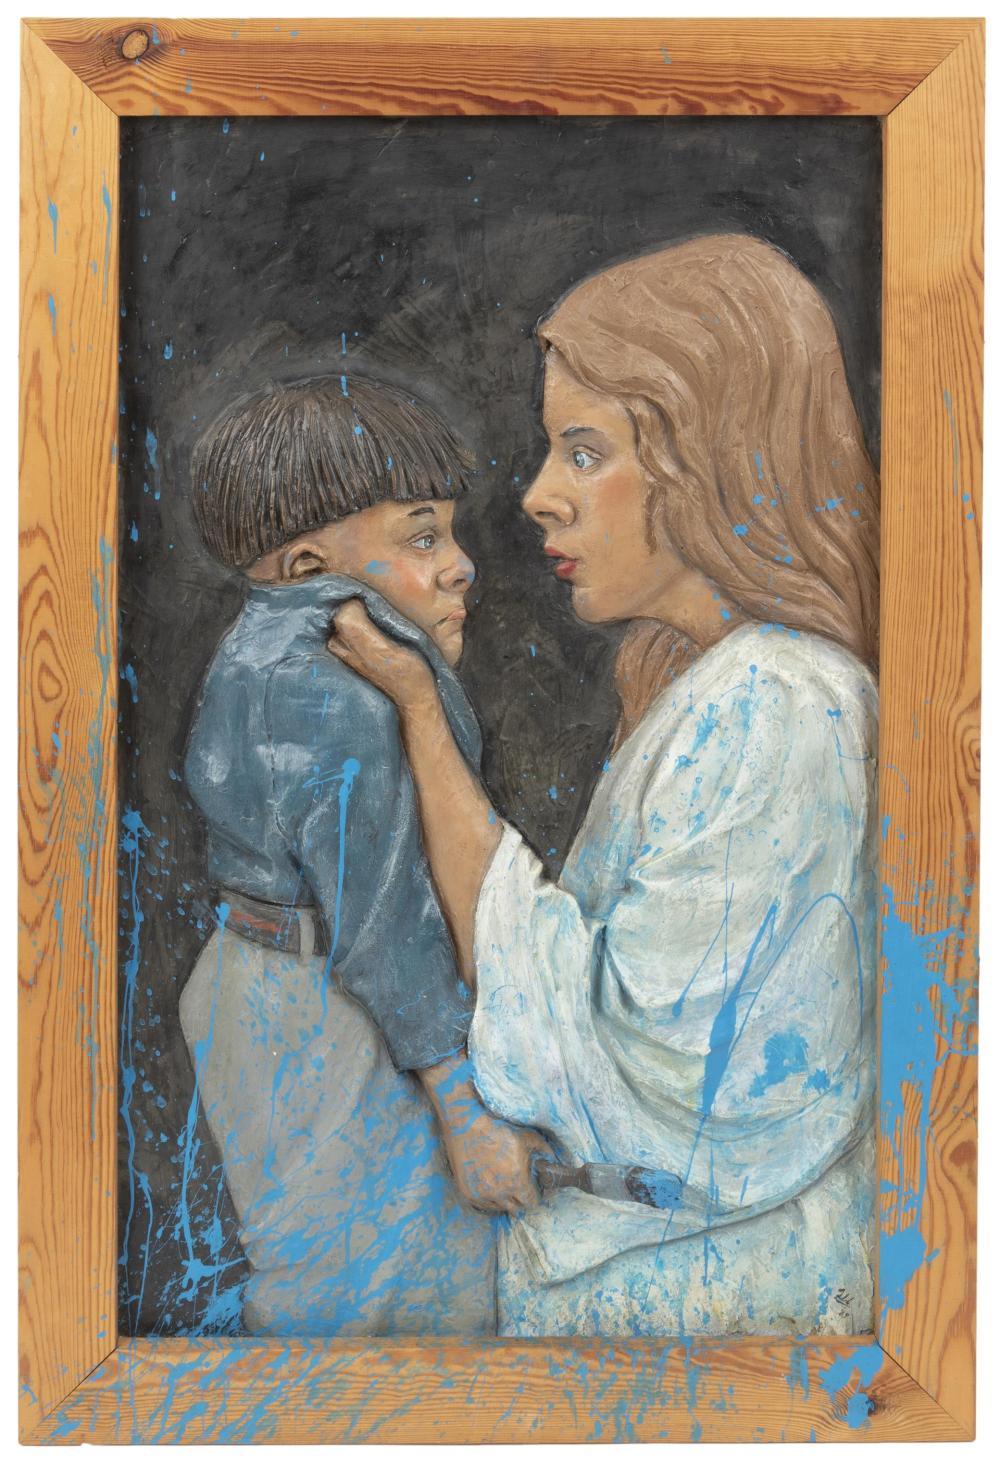 "Graham Ibbeson, (b. 1951, British), Mother scolding son, 1989, Fiberglass relief wall sculpture, 39.5"" H x 26.5"" W x 4"" D"